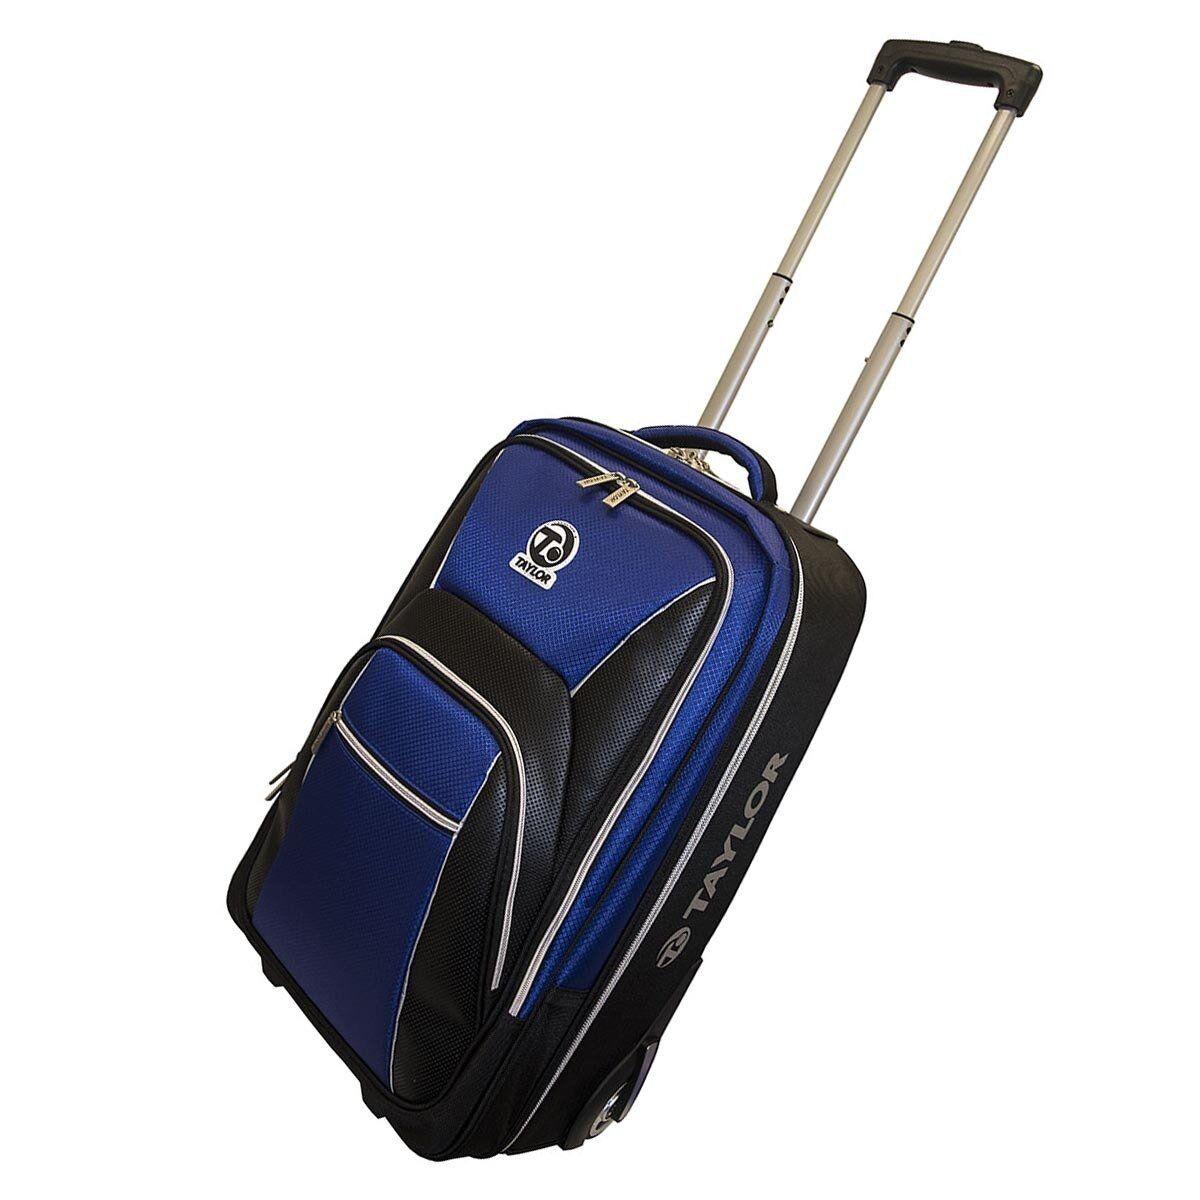 taylor bowls grand tourer trolley case lawn bowls bag travel luggage with wheels ebay. Black Bedroom Furniture Sets. Home Design Ideas